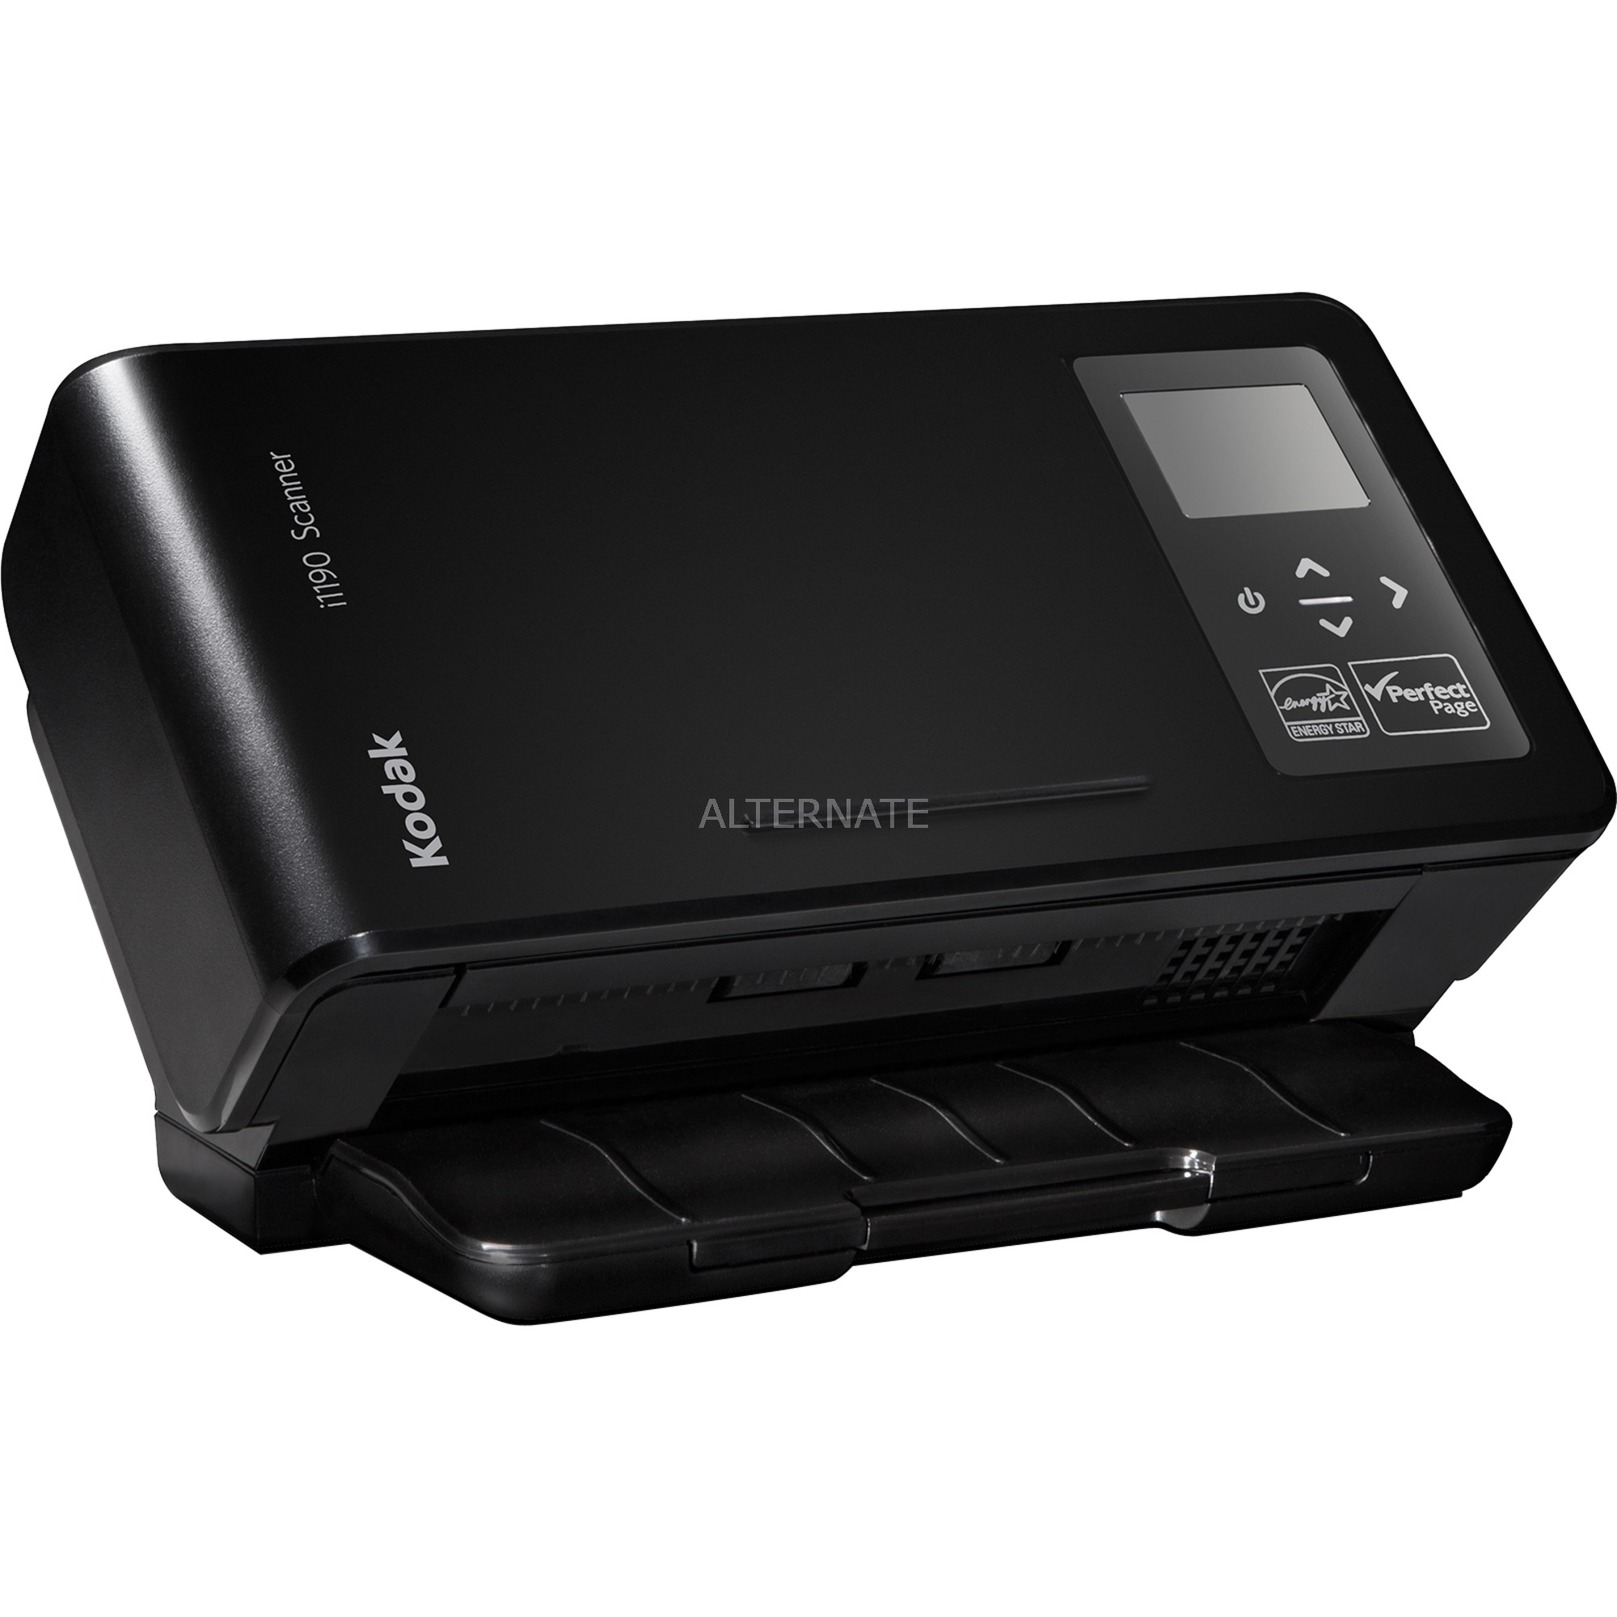 i1190 Scanner Escáner con alimentador automático de documentos (ADF) 600 x 600DPI A4 Negro